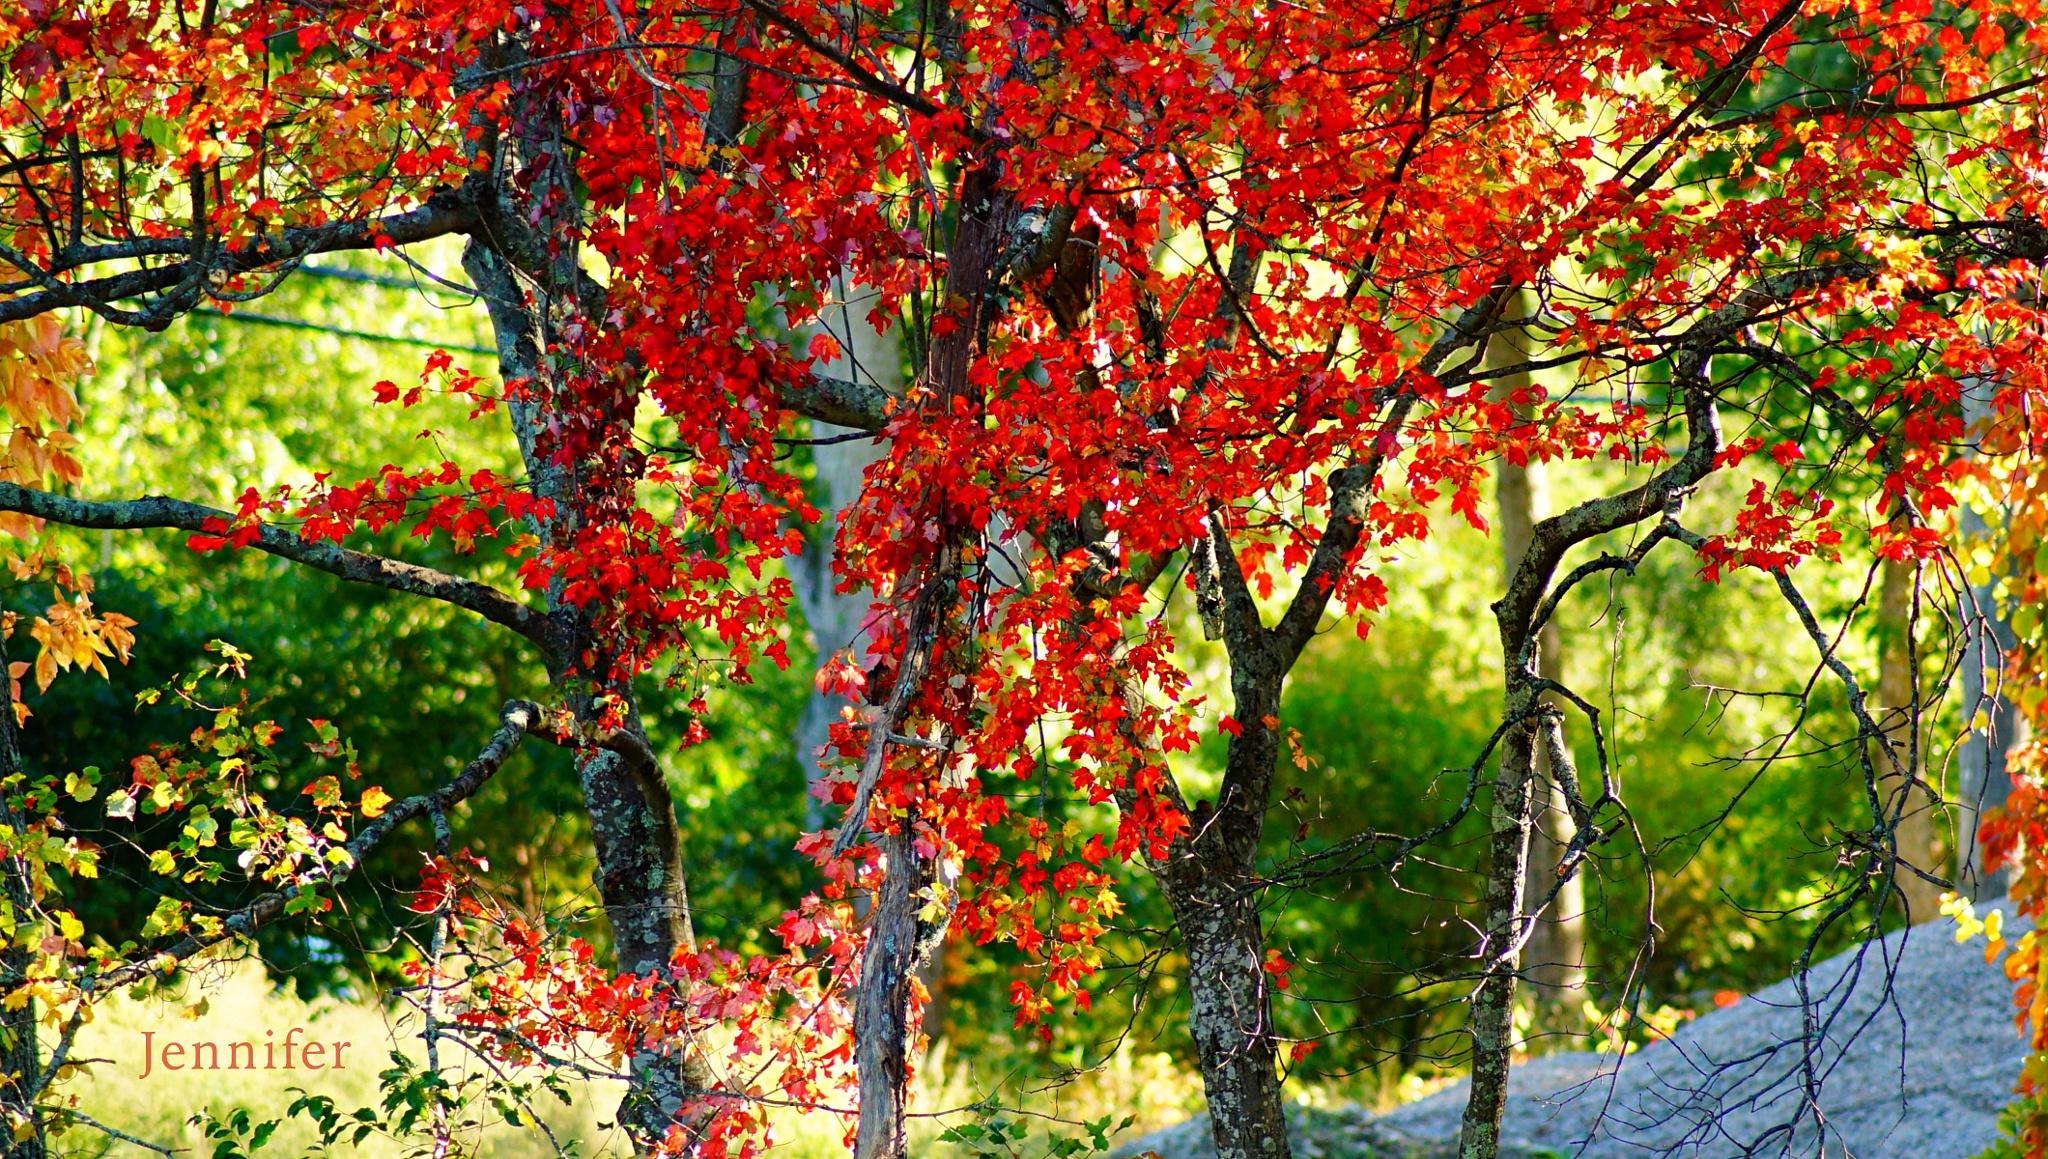 I feel like a vibrant red Autumn by Jennifer